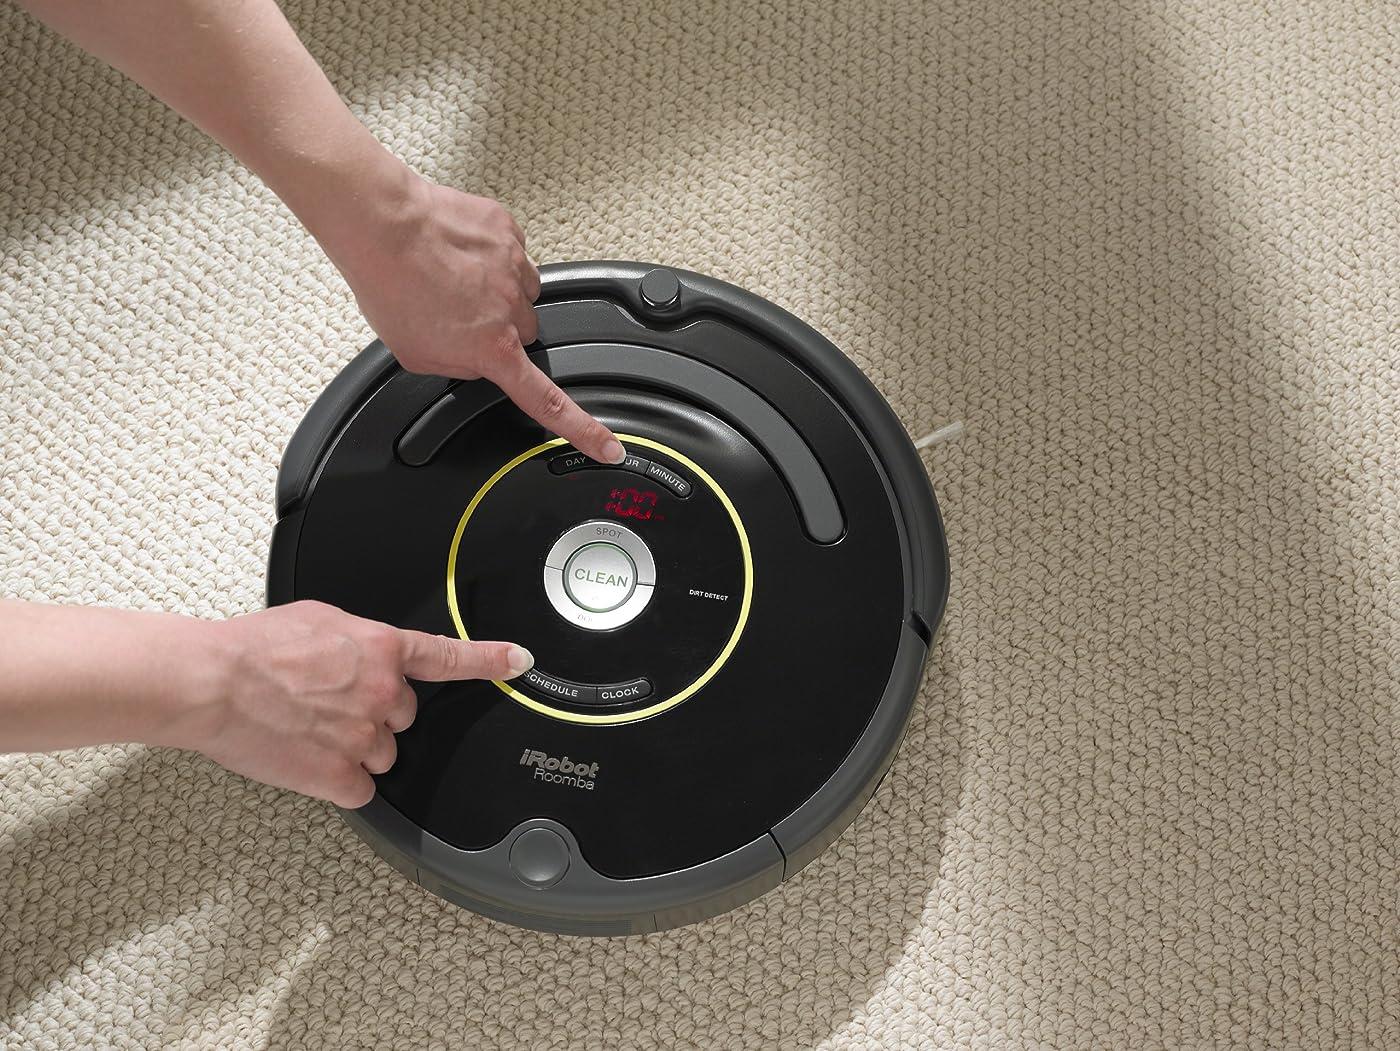 iRobot Roomba 650 Vacuum Cleaning Robot